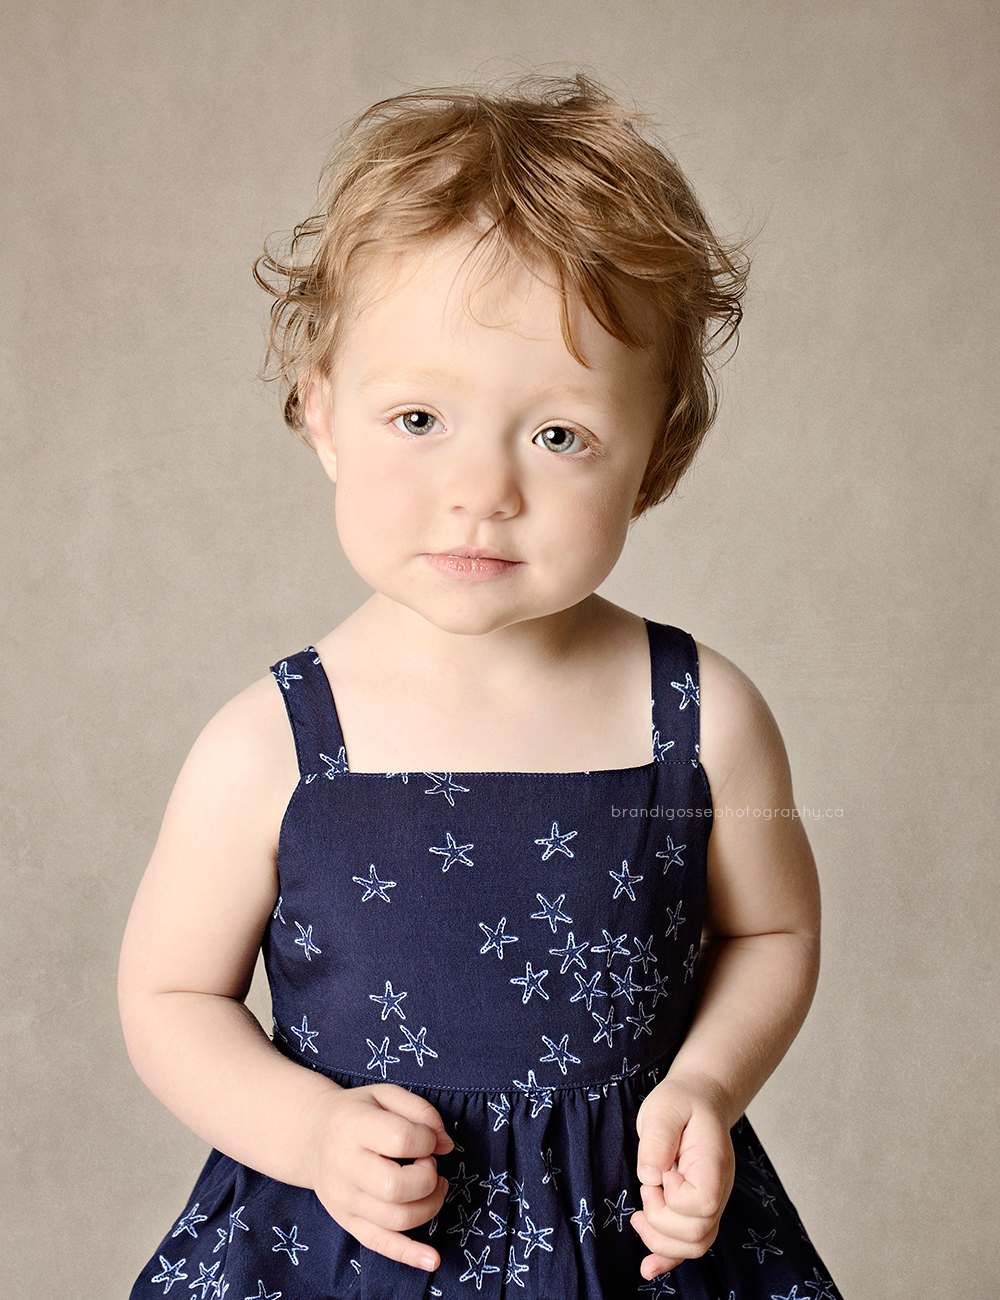 St. John's Baby Photographer